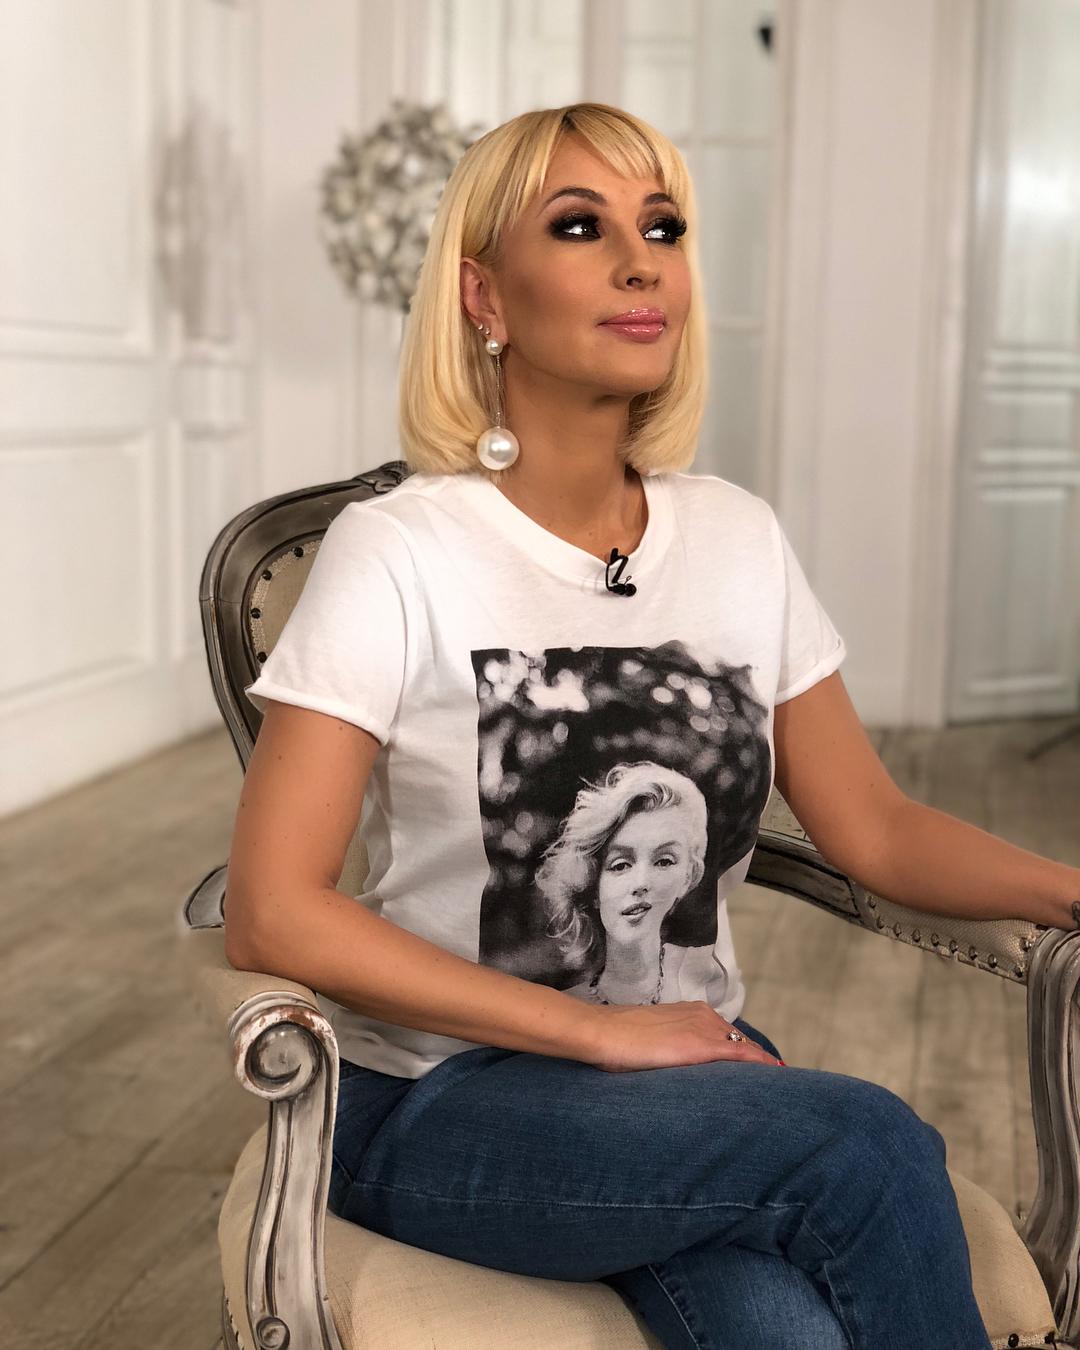 Лера кудрявцева причёска фото